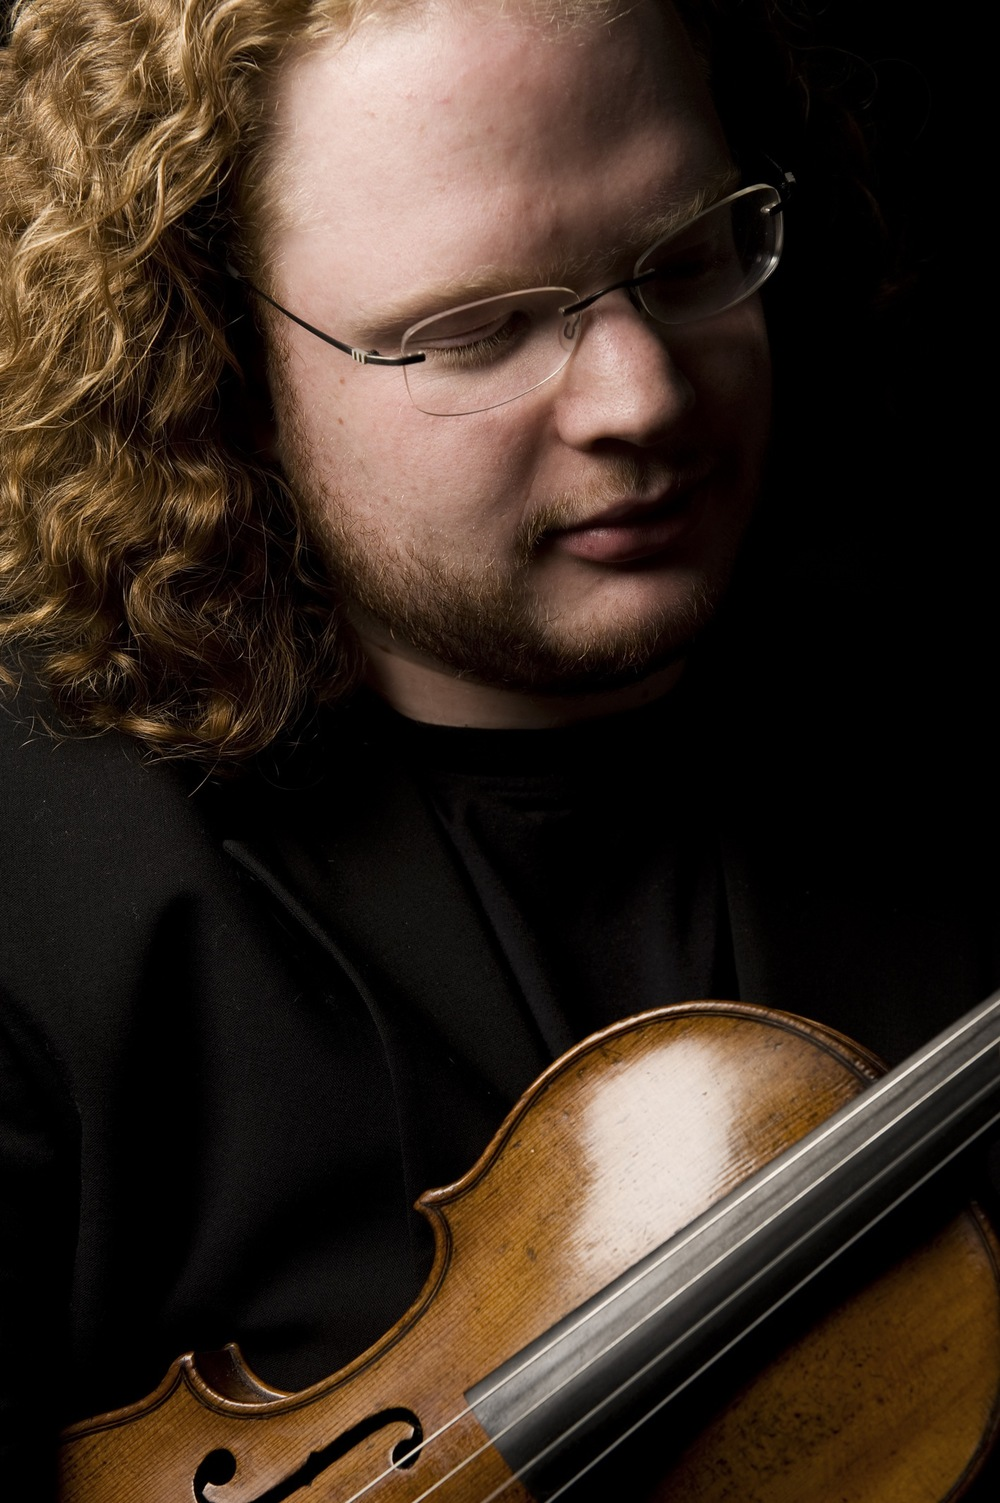 Michael Gurevich, 2013